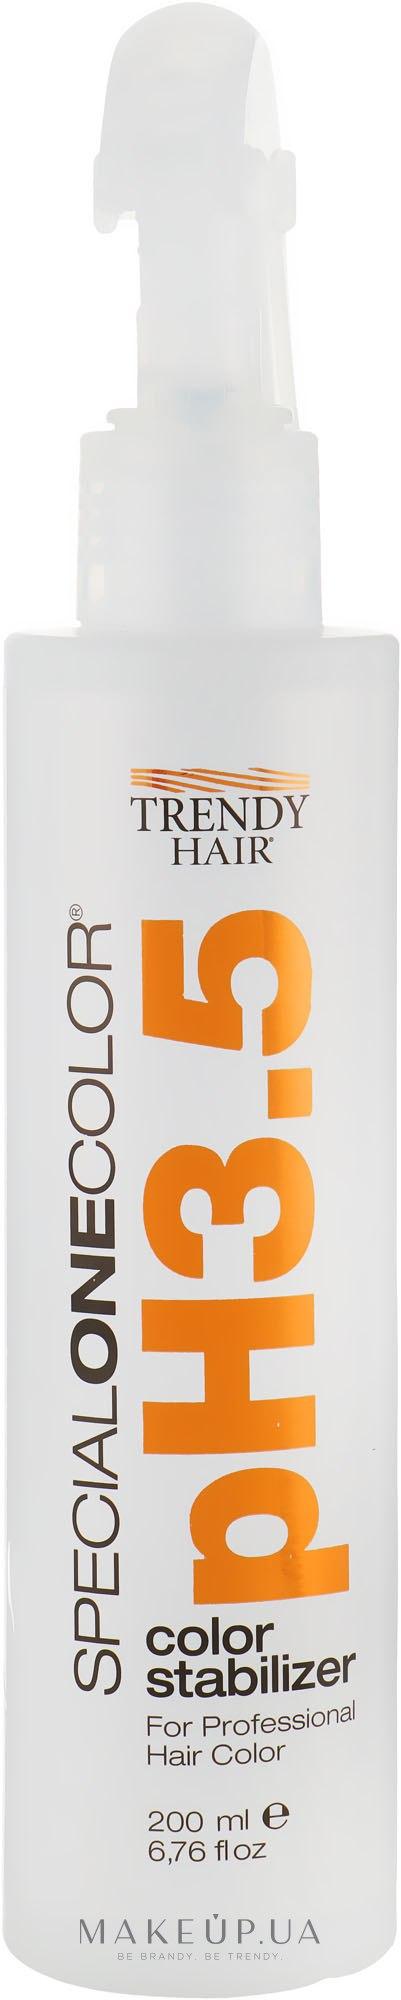 Стабилизатор цвета после окрашивания - Trendy Hair Specialonecolor PH 3,5 Color Stabilizer — фото 200ml